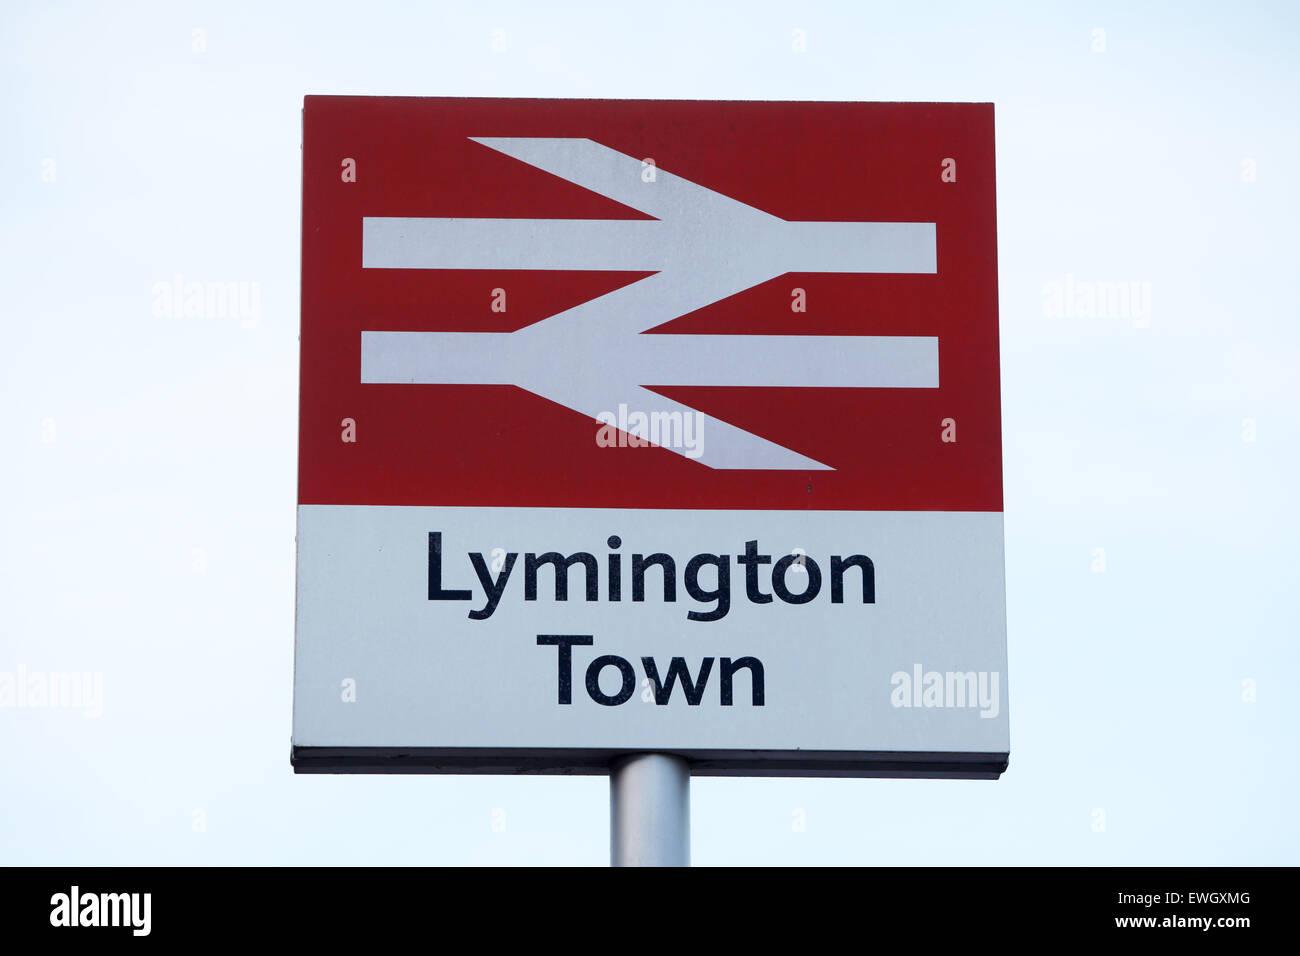 Lymington Railway Station, Lymington, Hampshire - Stock Image